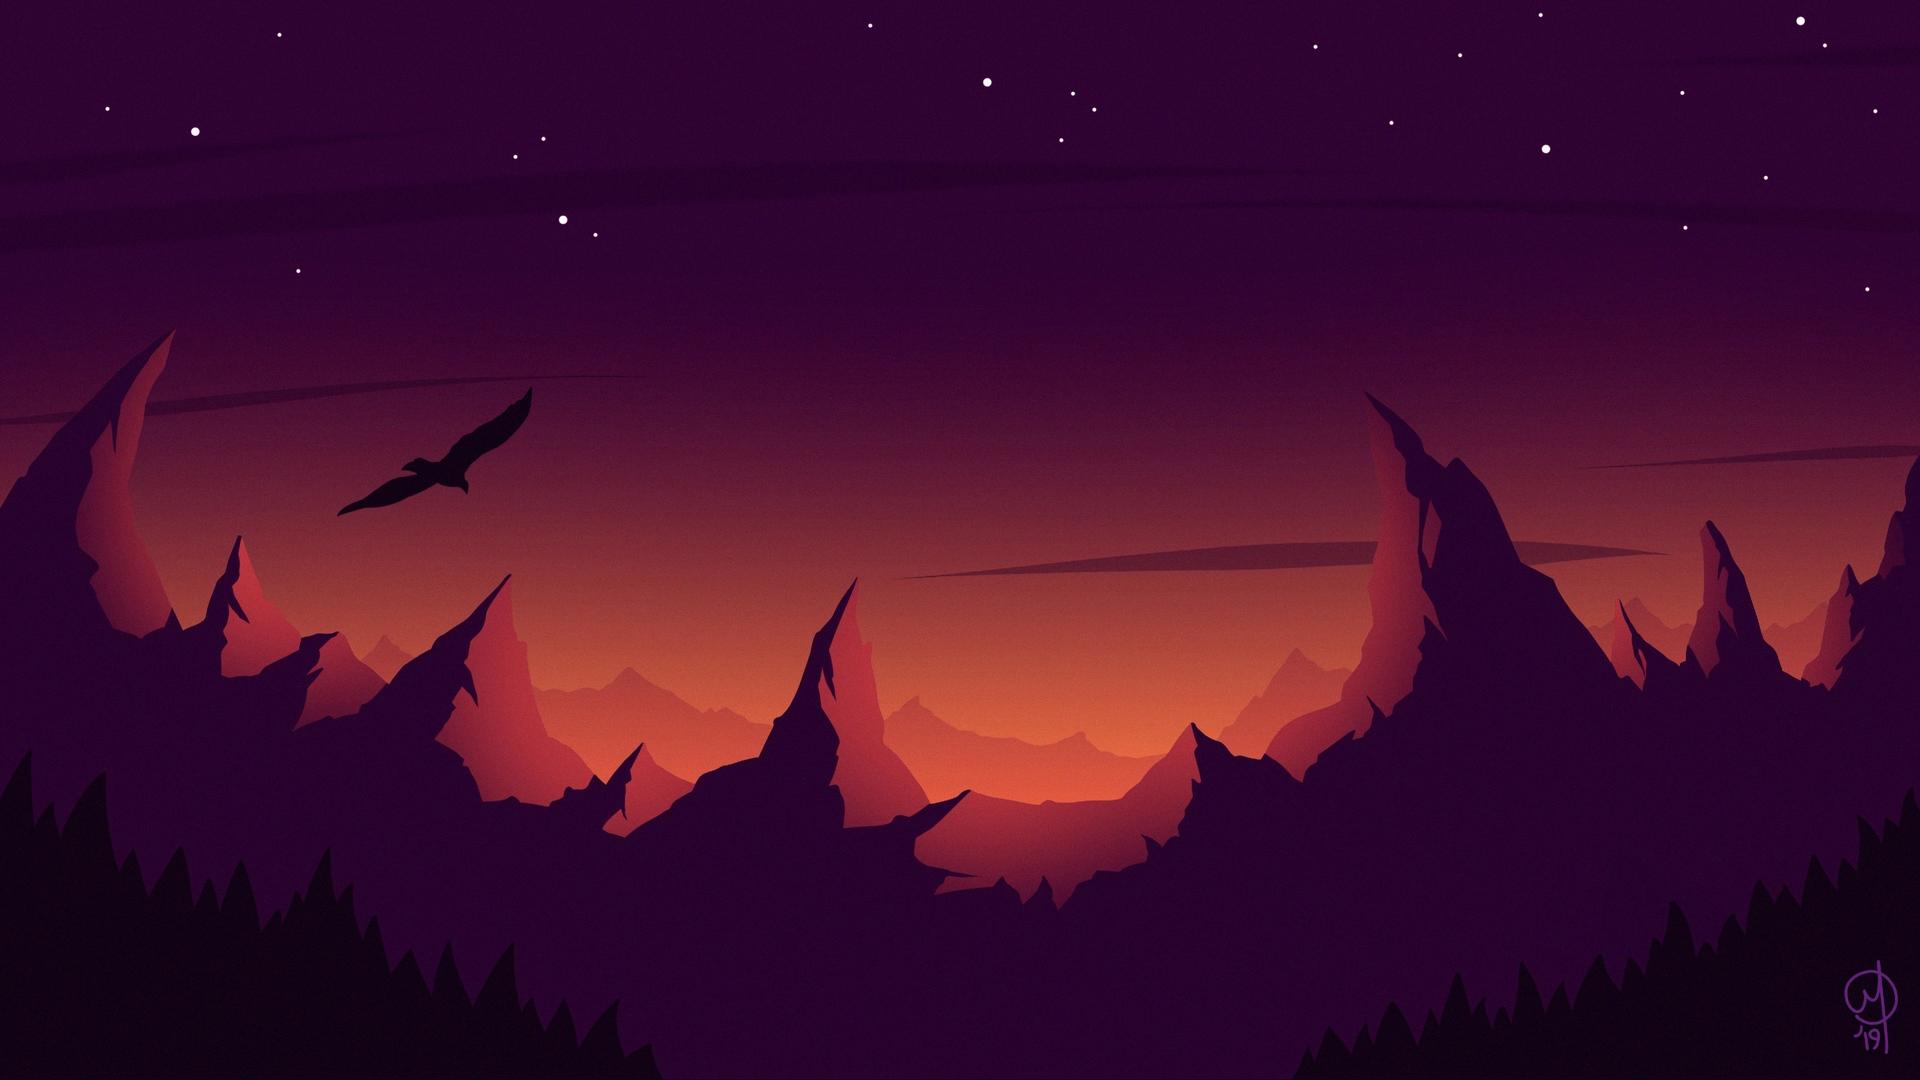 Download wallpaper 1920x1080 bird silhouette vector mountains 1920x1080